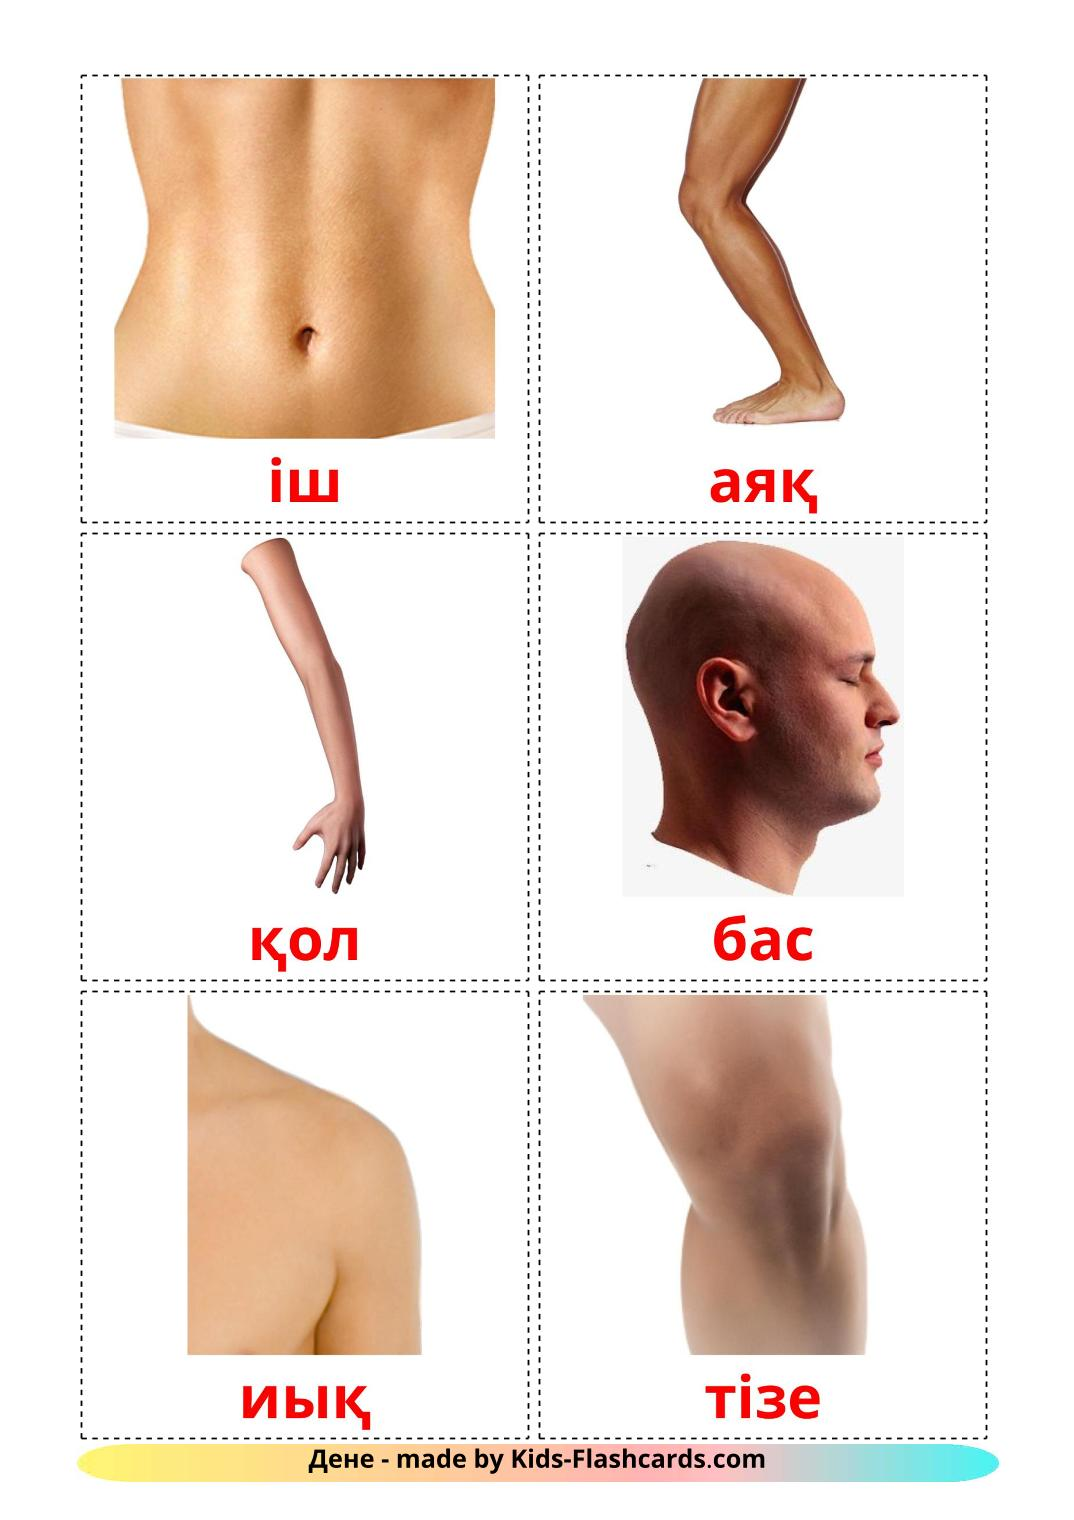 Body Parts - 26 Free Printable kazakh Flashcards